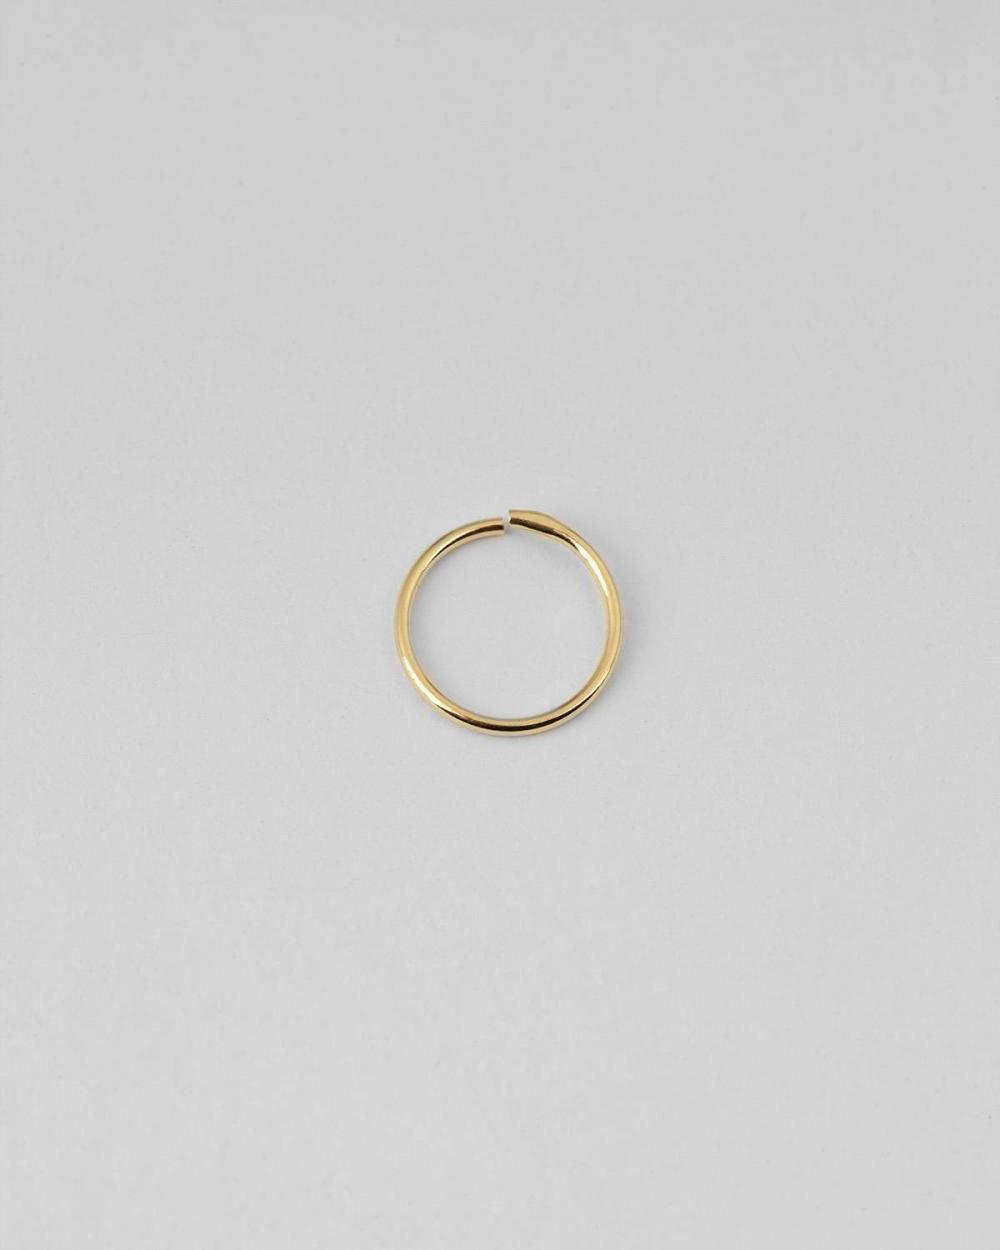 Earrings YELLOW GOLD MINI SINGLE HOOP EARRING 012 D12 NOVE25